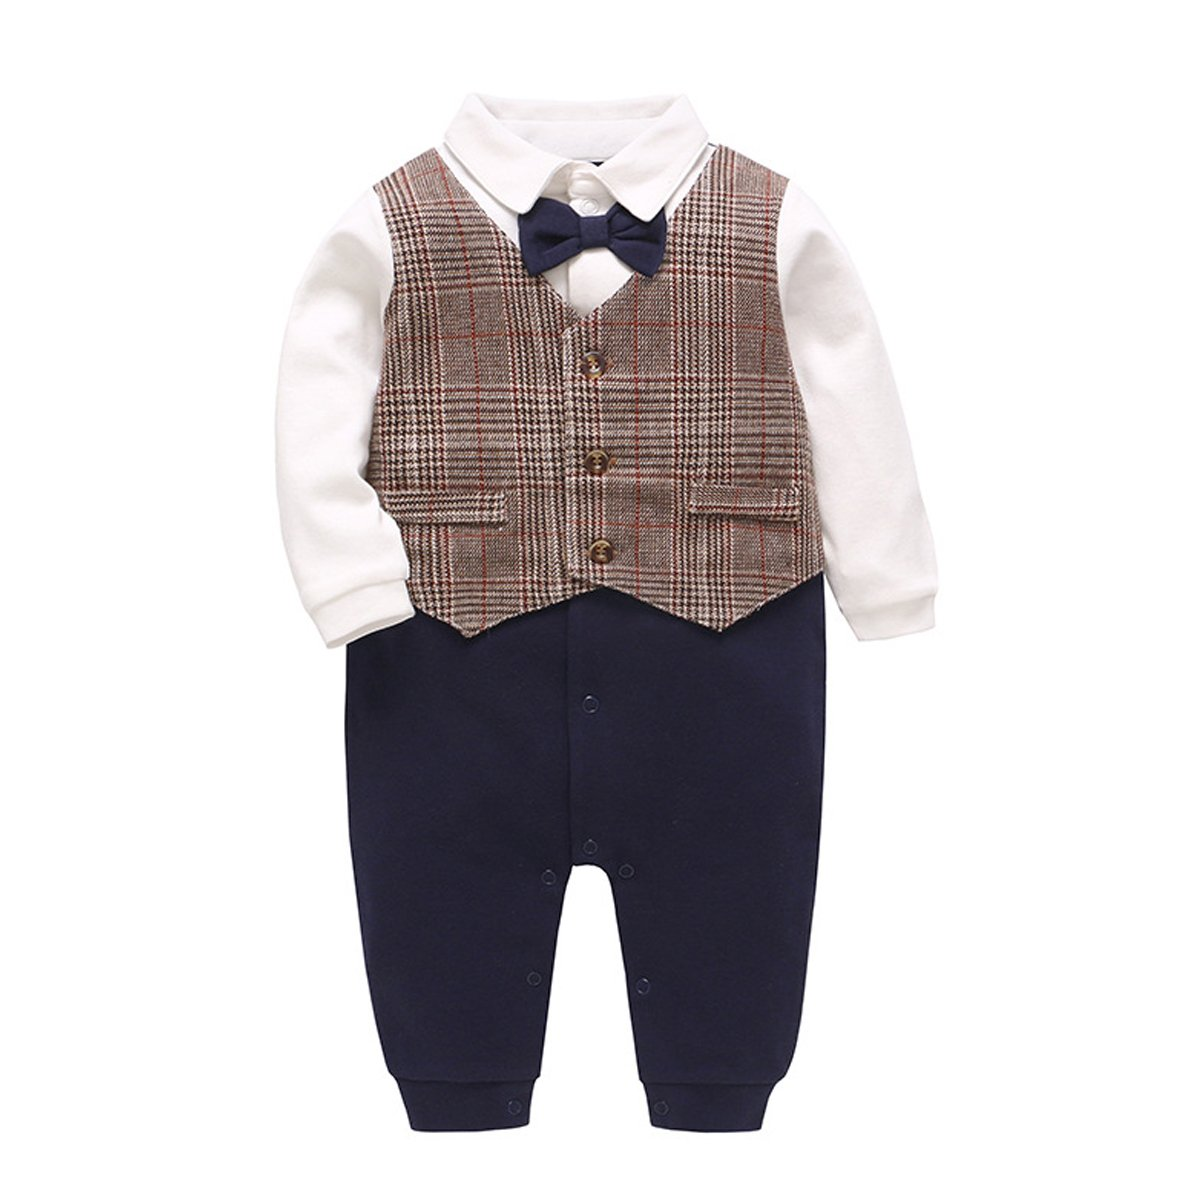 Kanodan Baby Boy Wedding Gentleman Romper Suits with Bowtie Onesie Jumpsuits